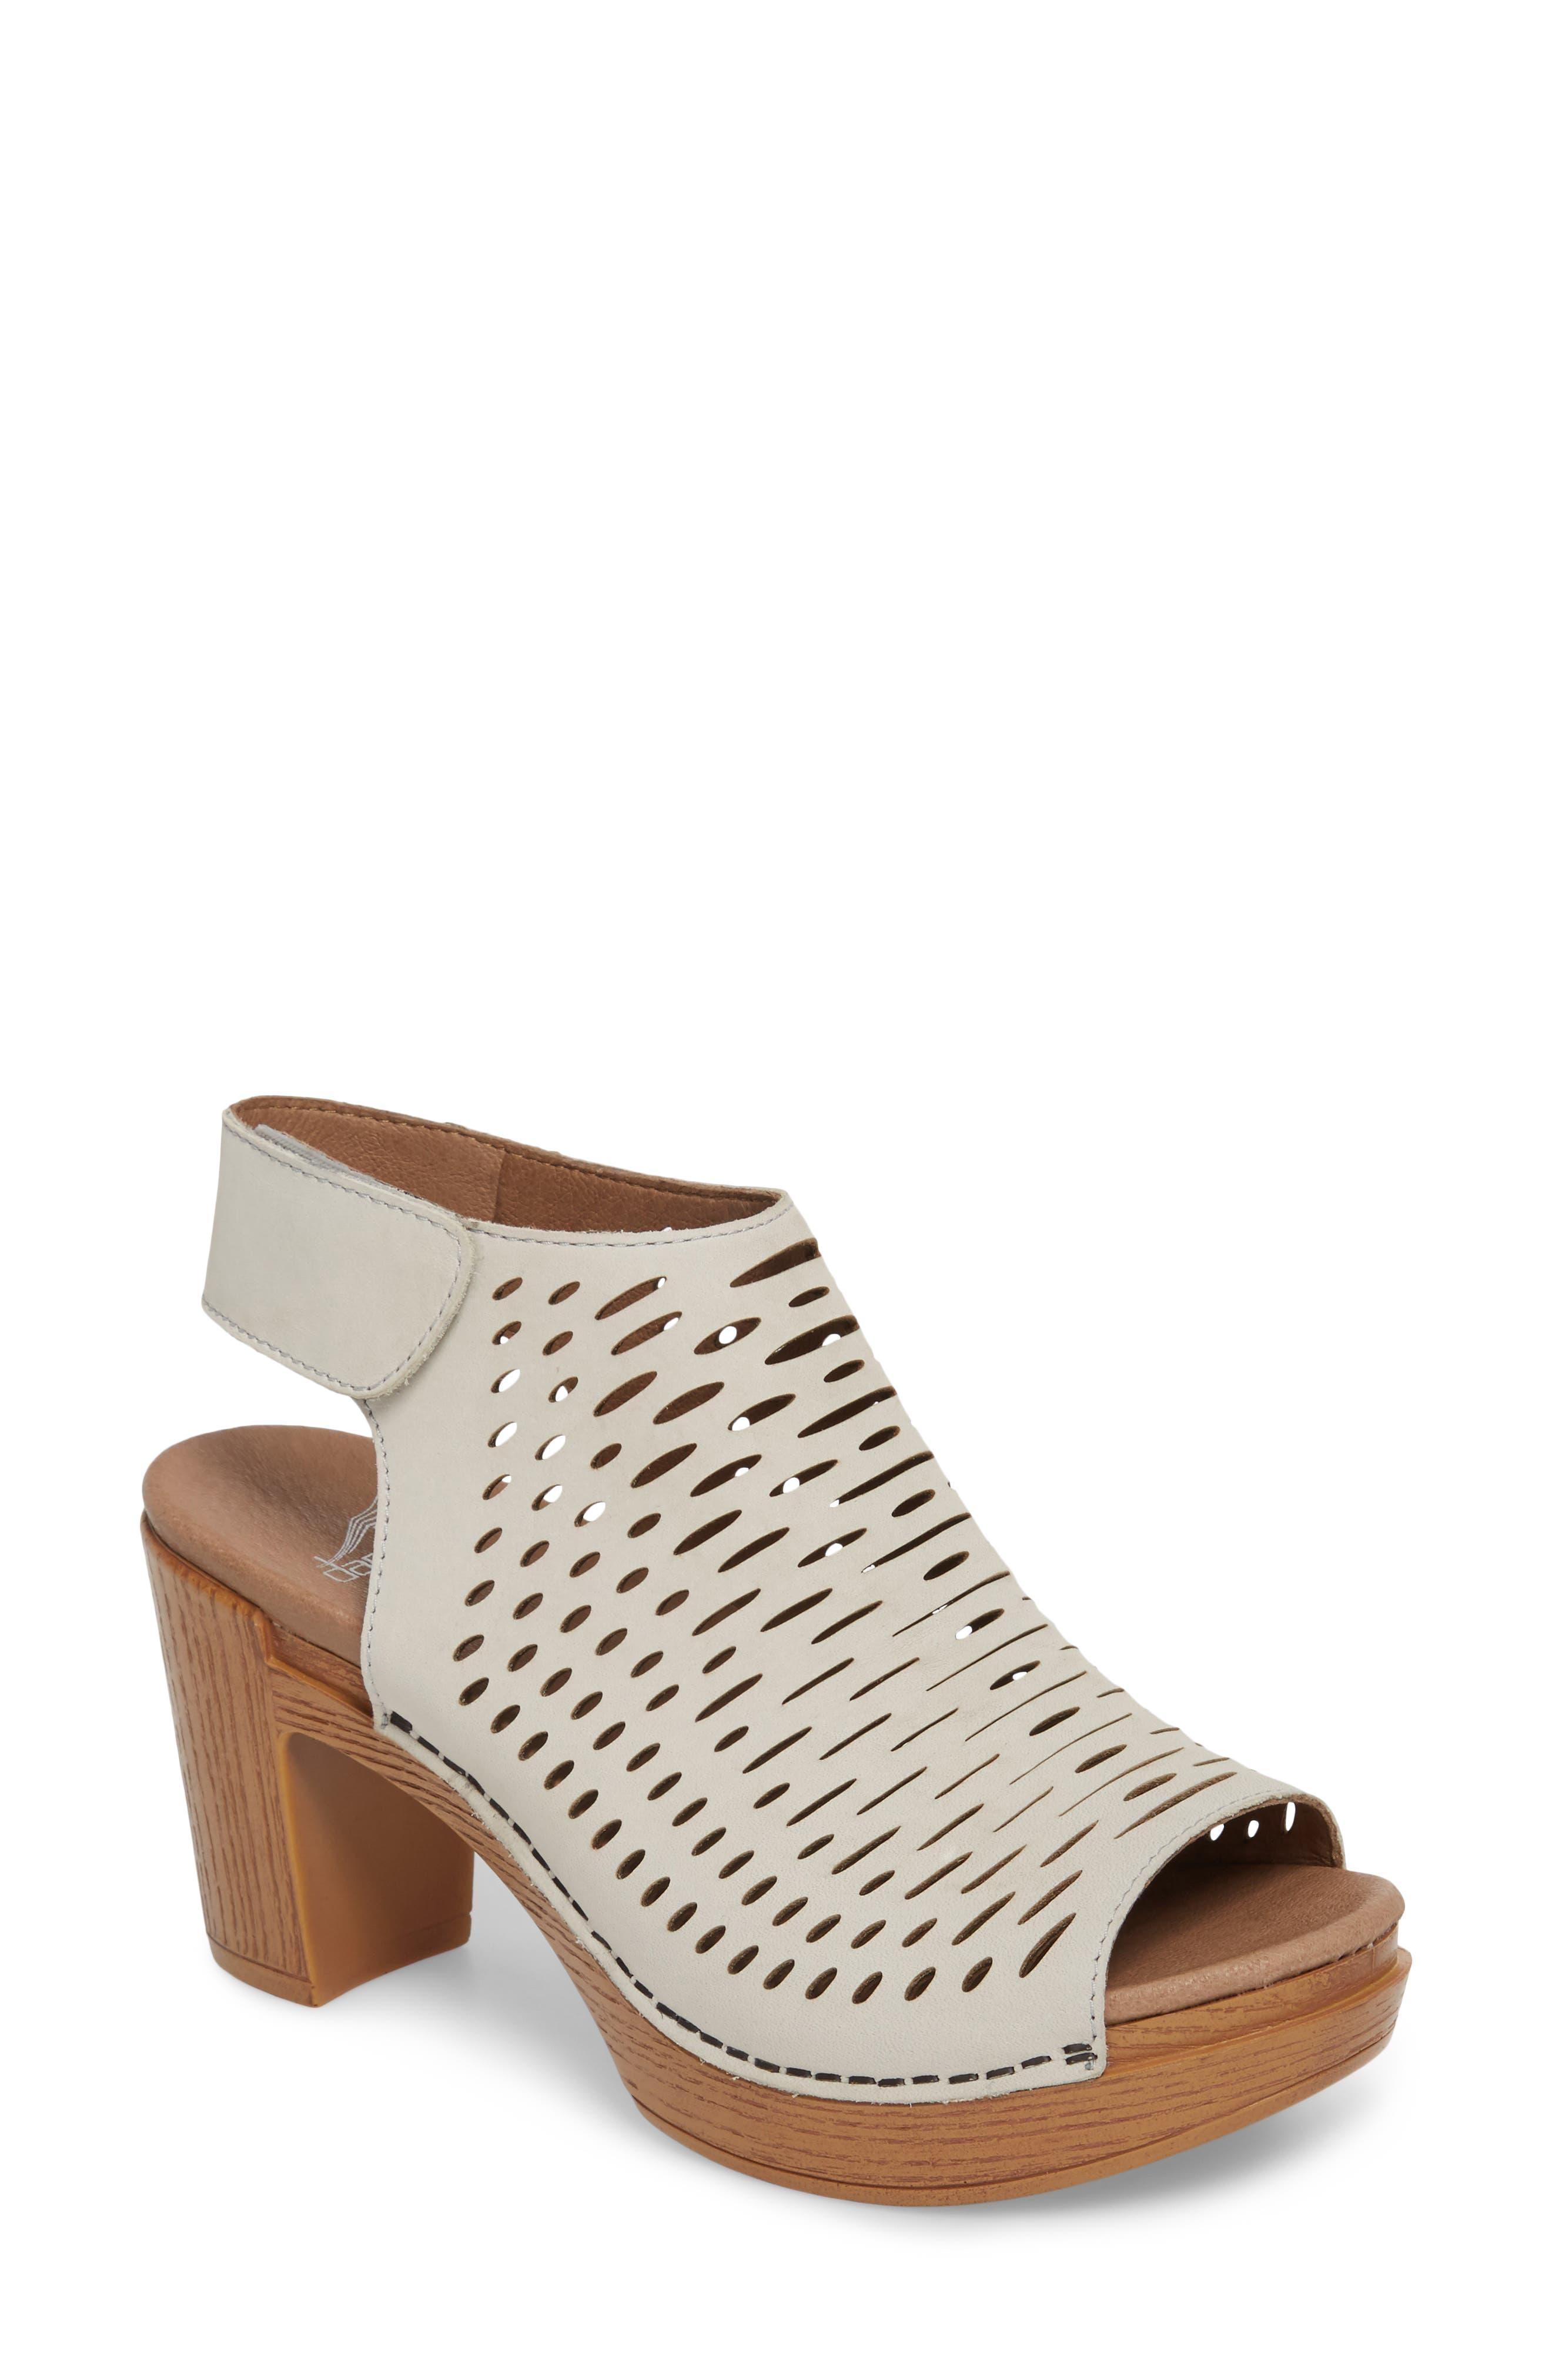 Dansko Women's Danae Block Heel Sandal xSigGzNl